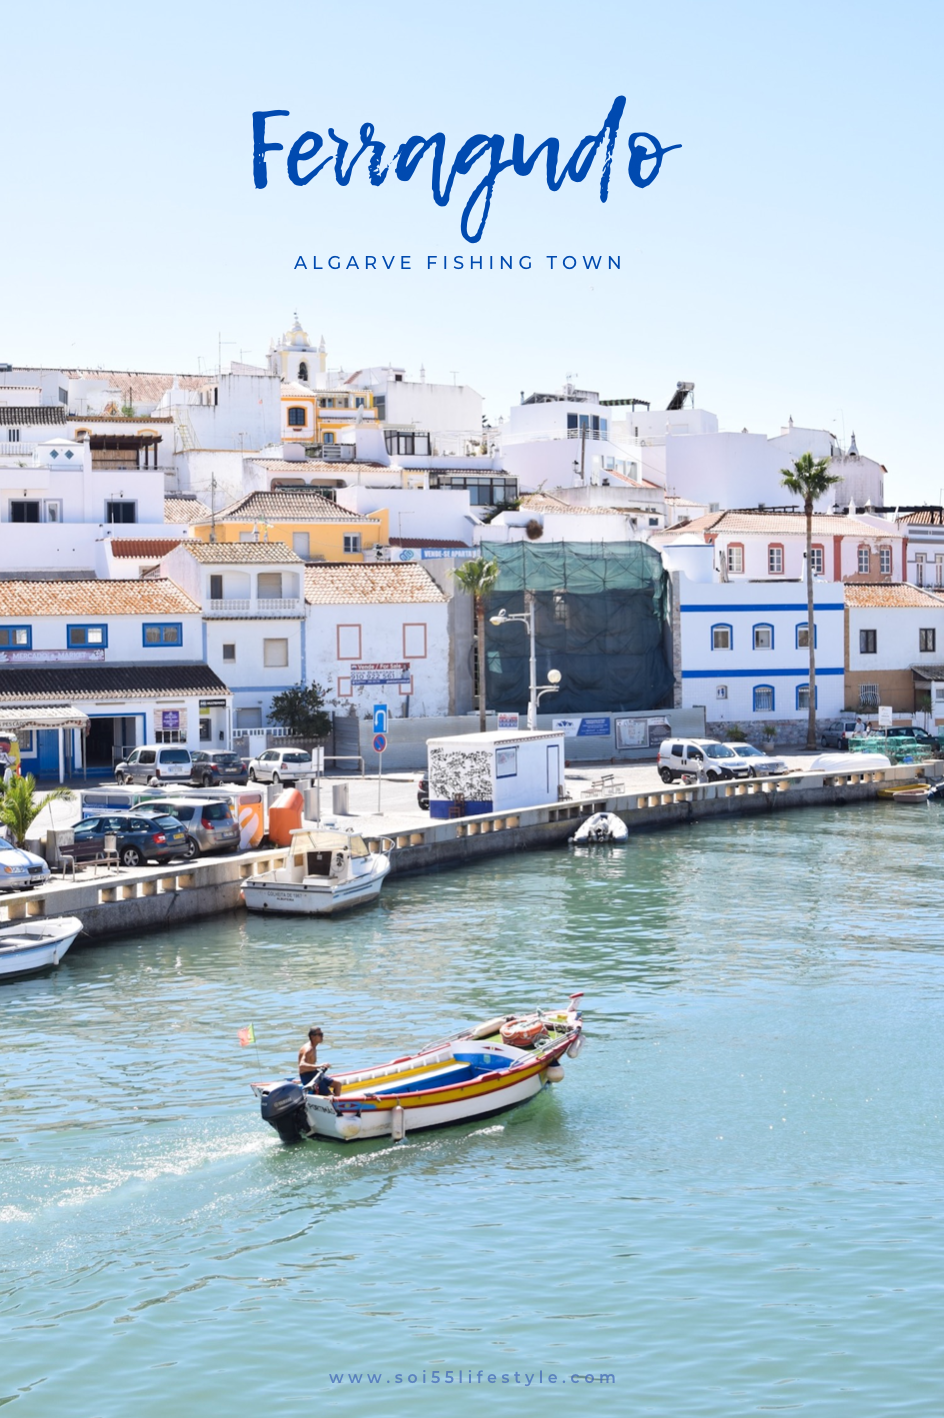 Ferragudo-Algarve-Fishing-Village-pin.png